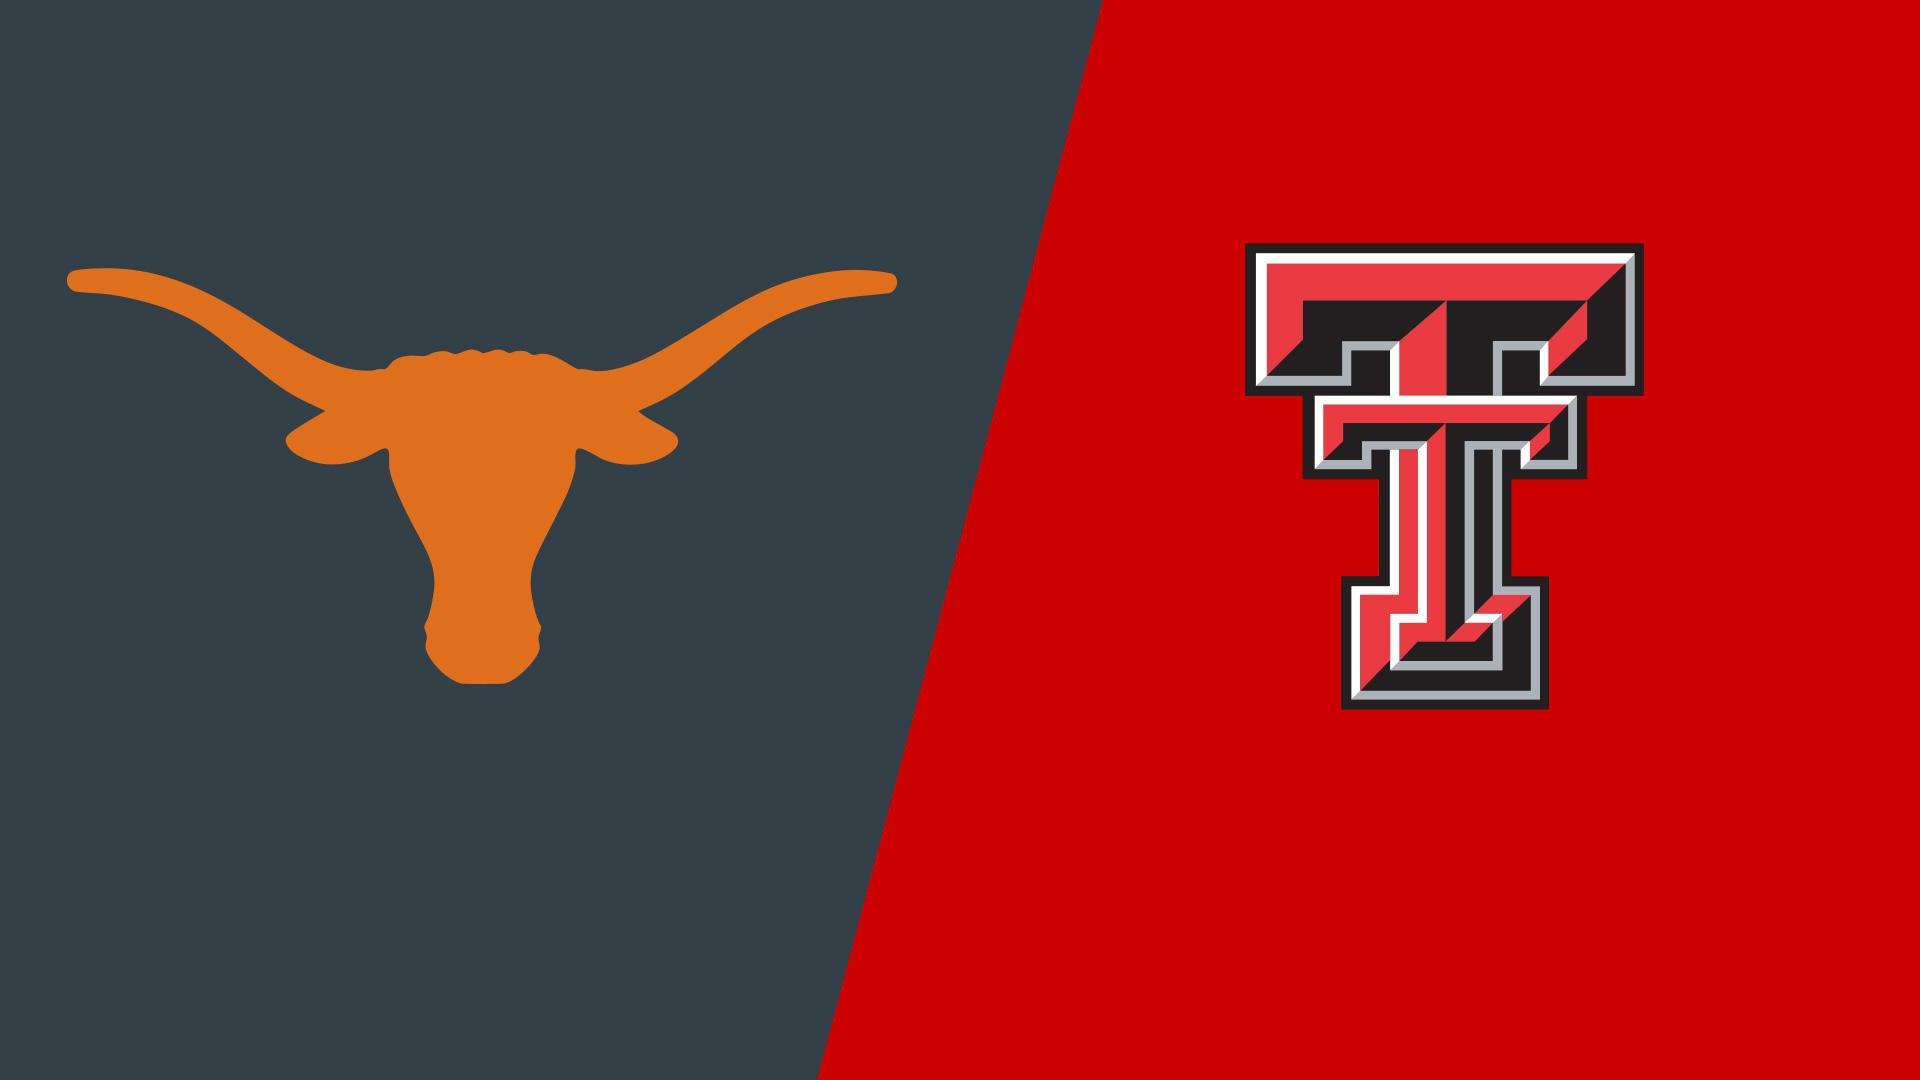 cbb-texas-texastech-matchupthumbnail